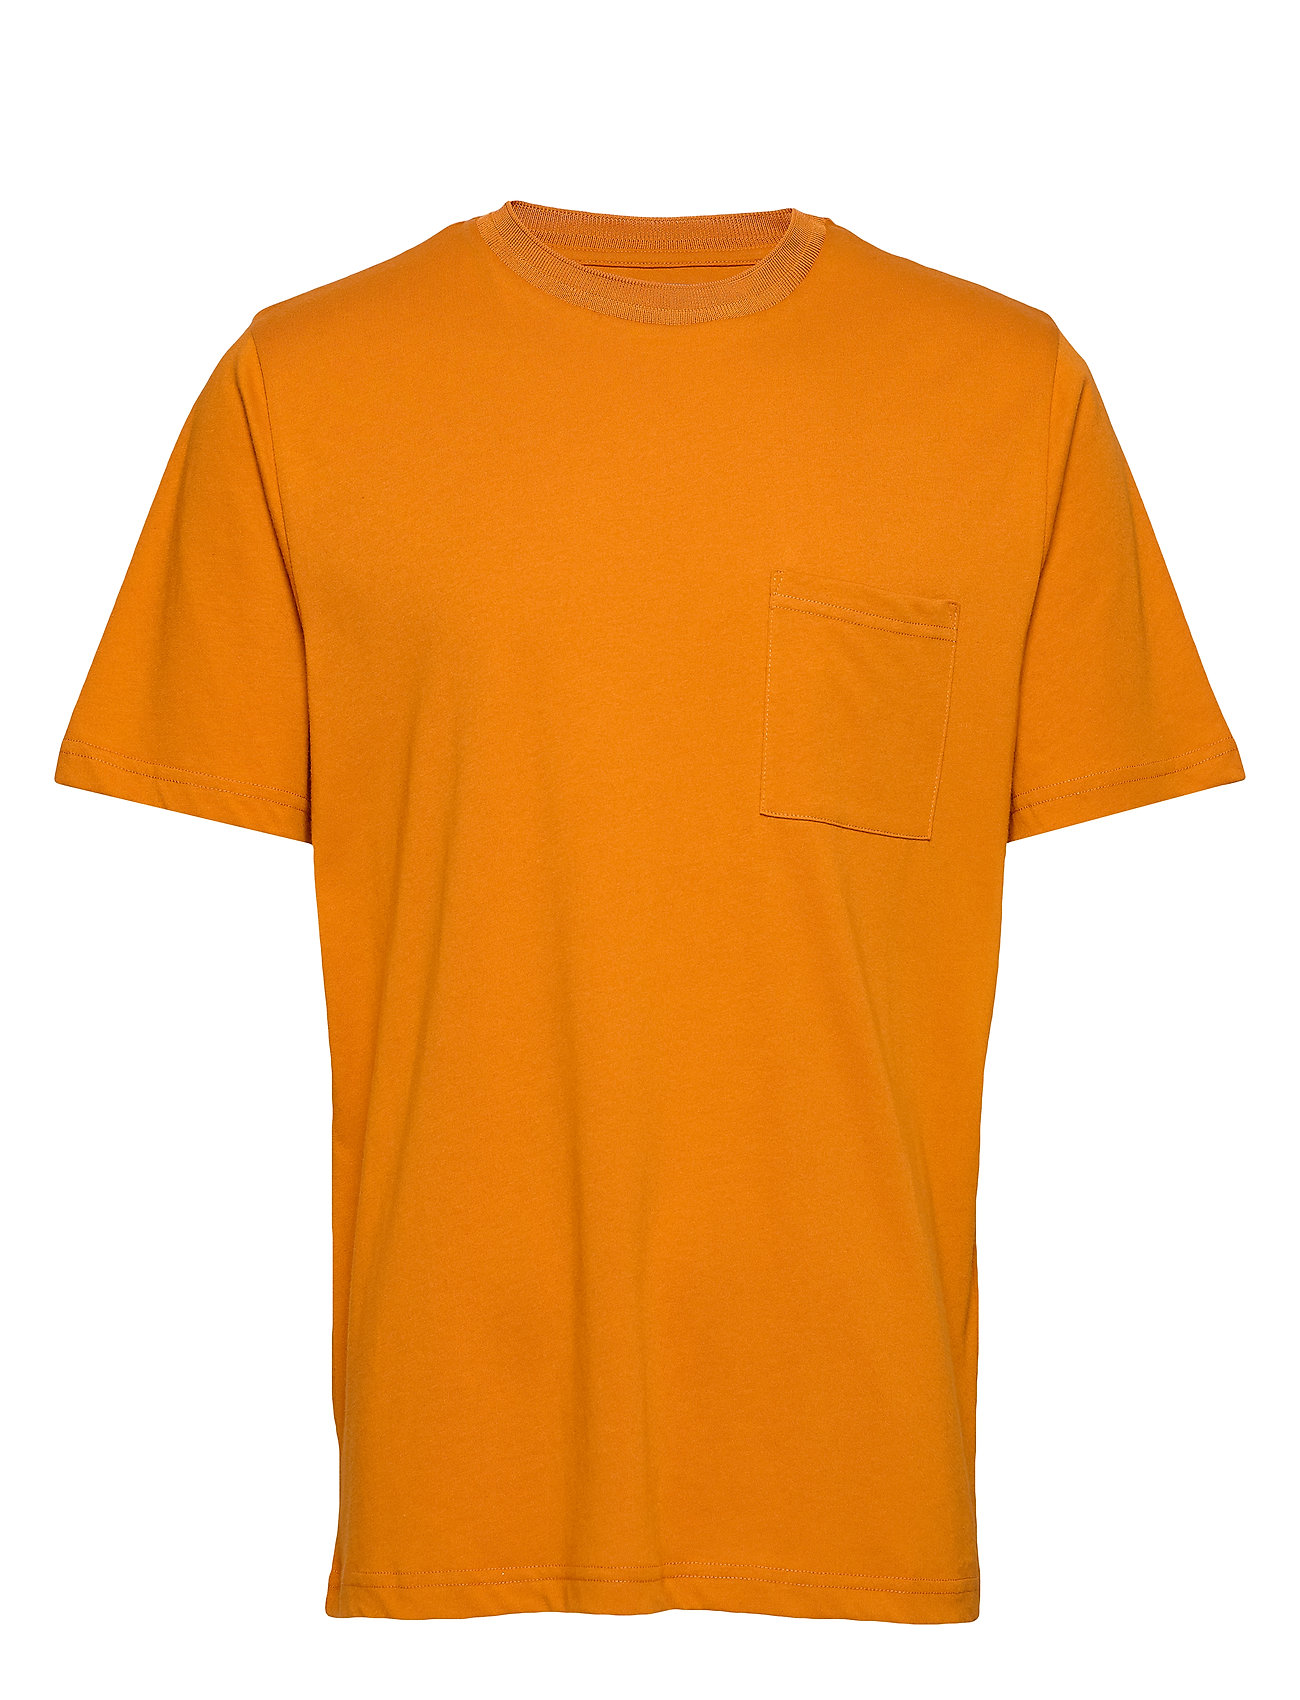 Samsøe Samsøe Bevtoft t-shirt 10964 - HONEY GINGER